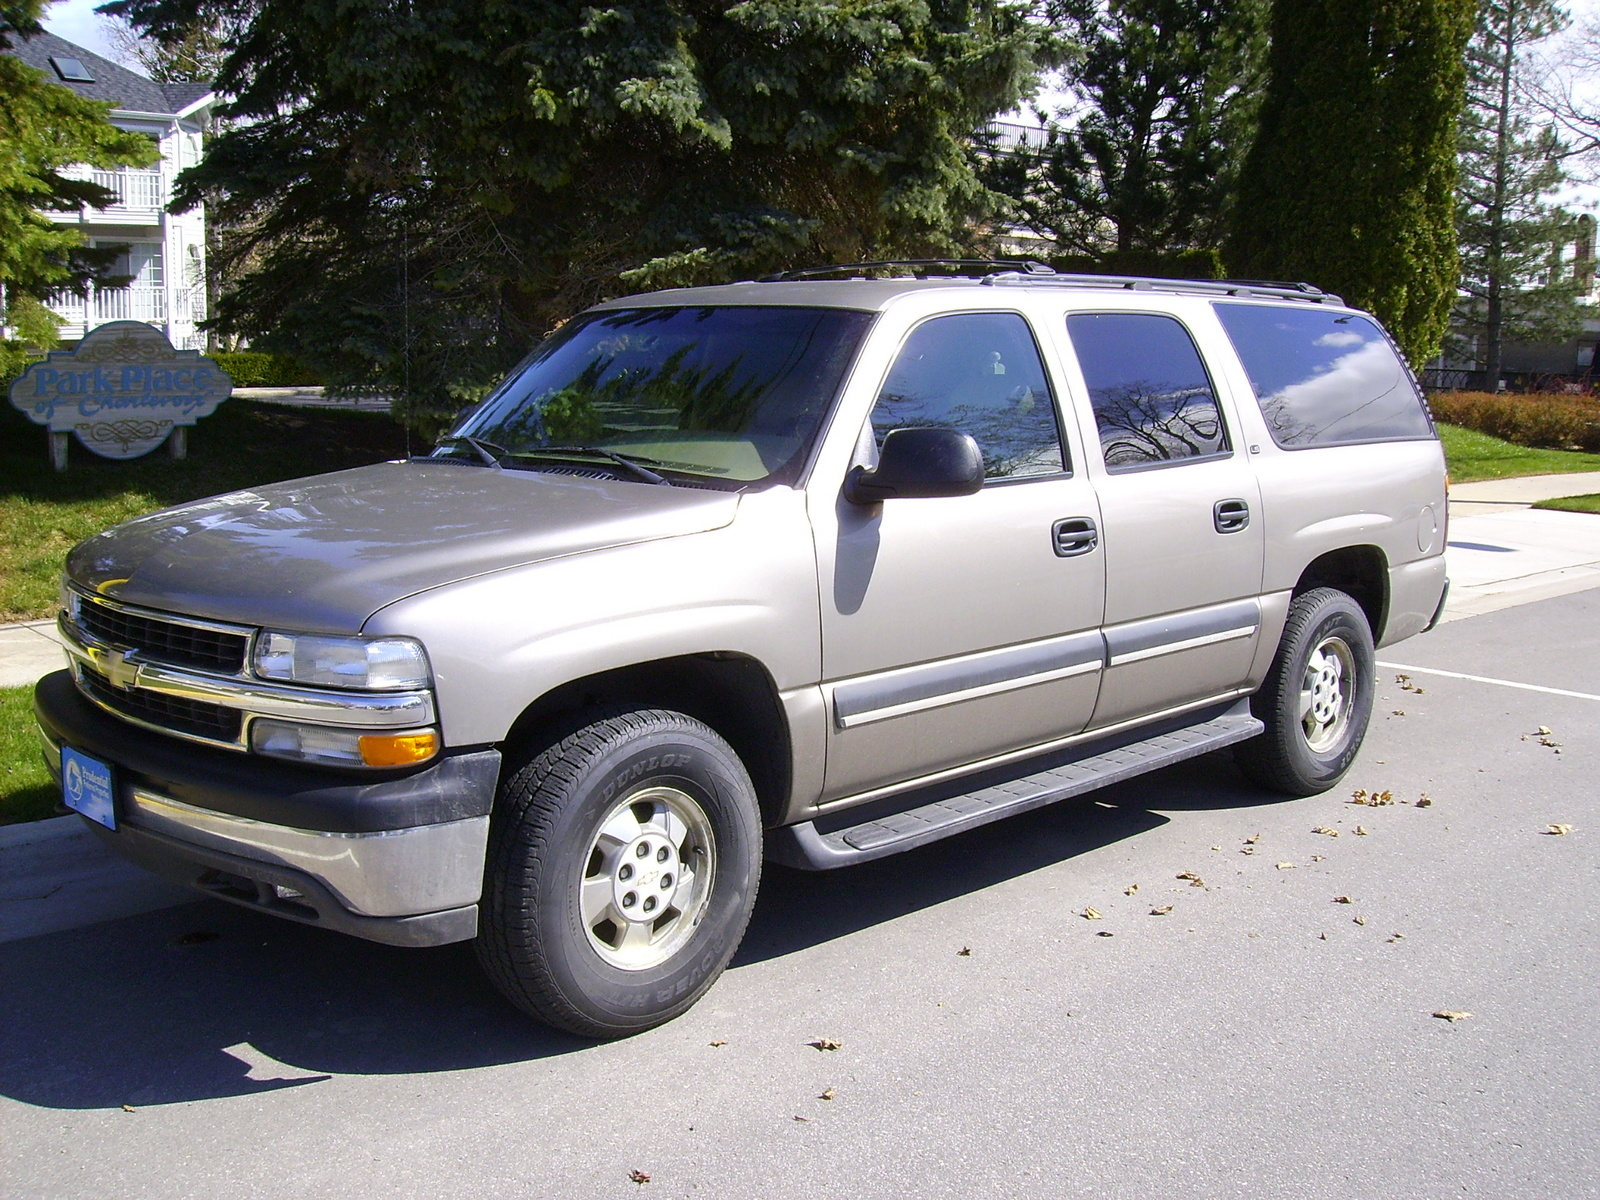 2001 Chevrolet Suburban Images Upcomingcarshq Com